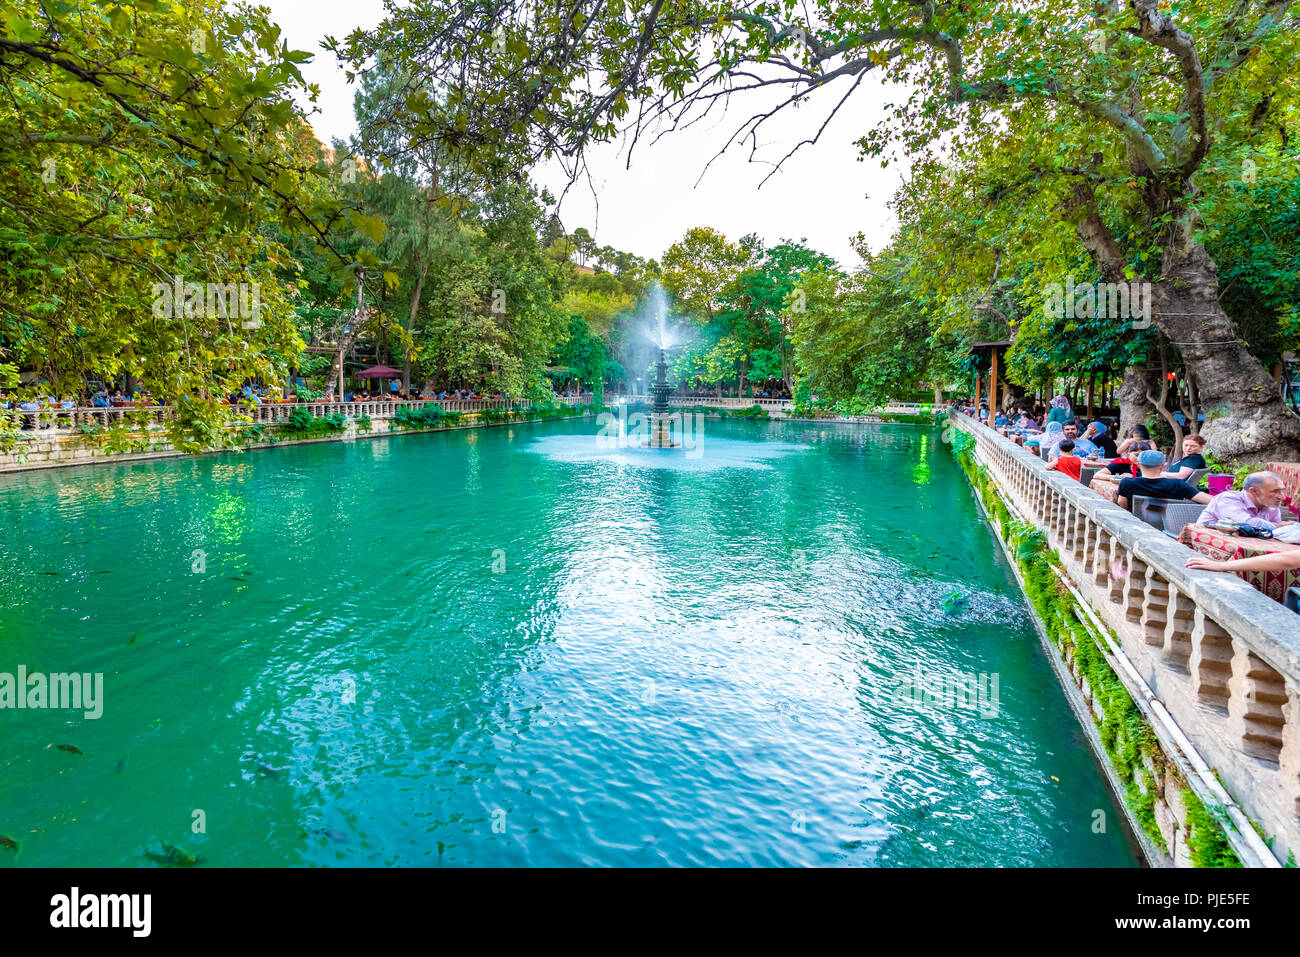 Unidentified people sit around Aynzeliha Lake,second sacred pool within Golbasi Park in Sanliurfa.Turkey.18 July 2018 - Stock Image